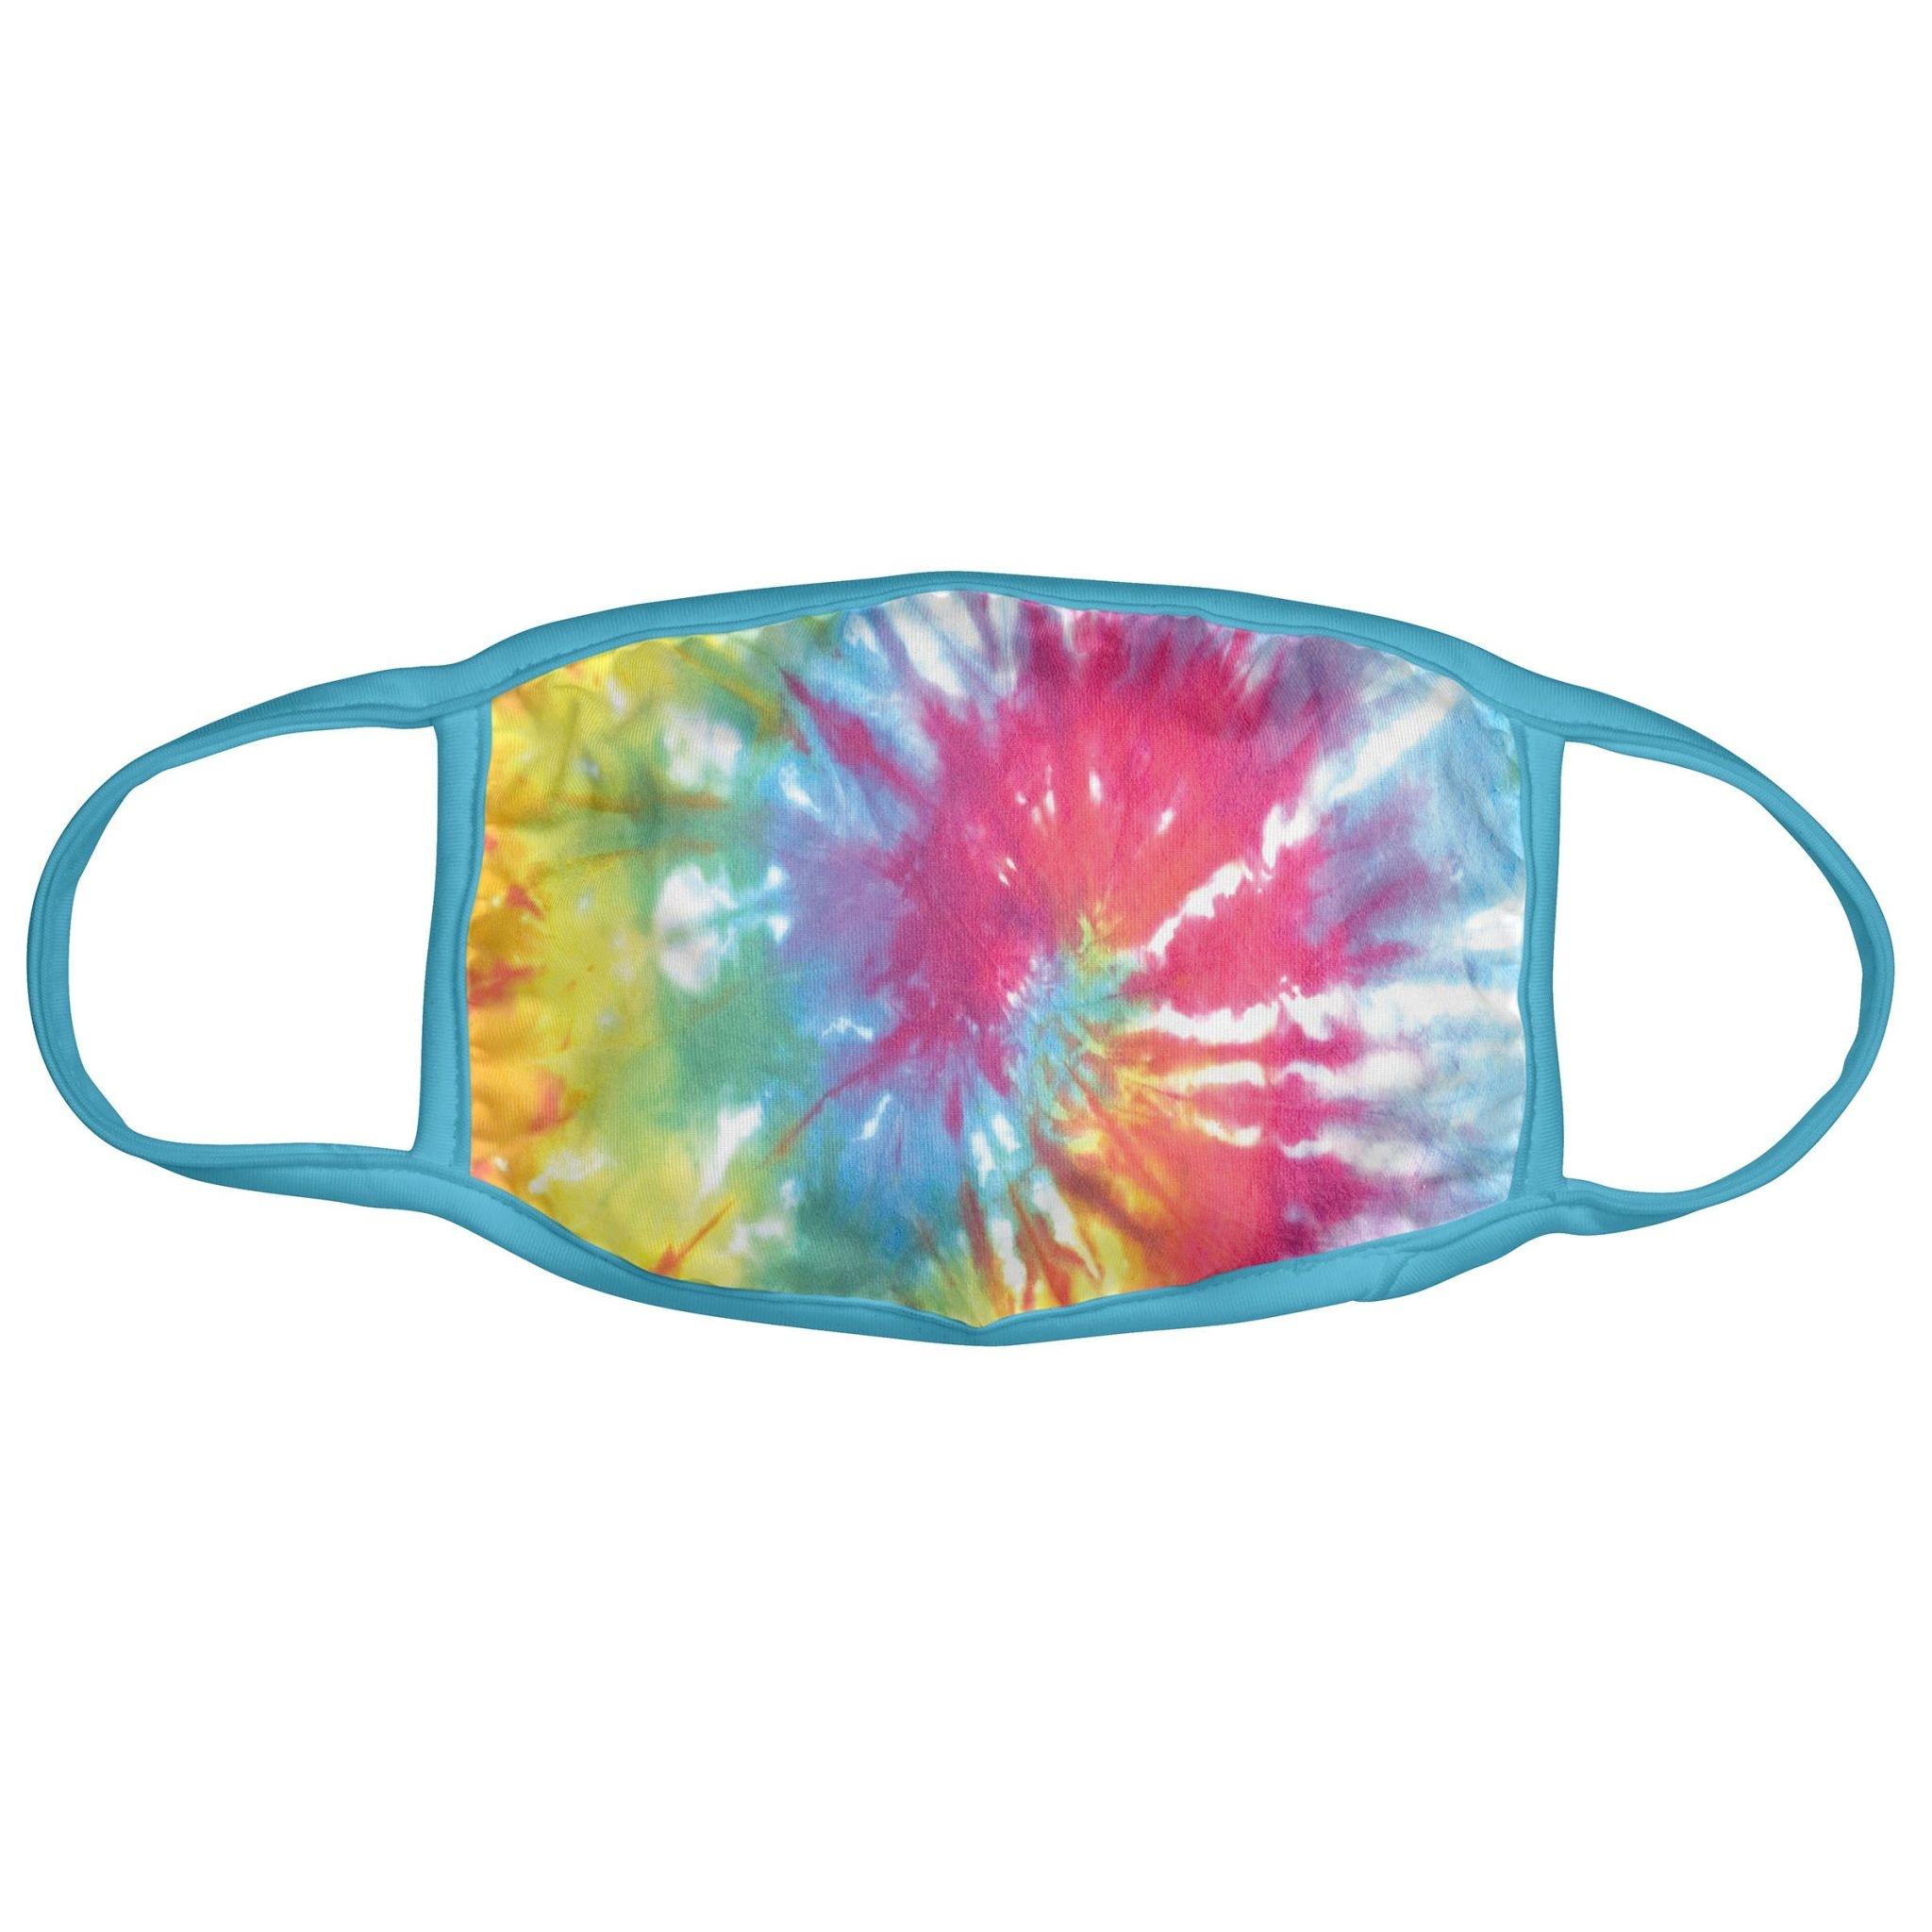 Karma Face Mask - Adult - Shatter Neon